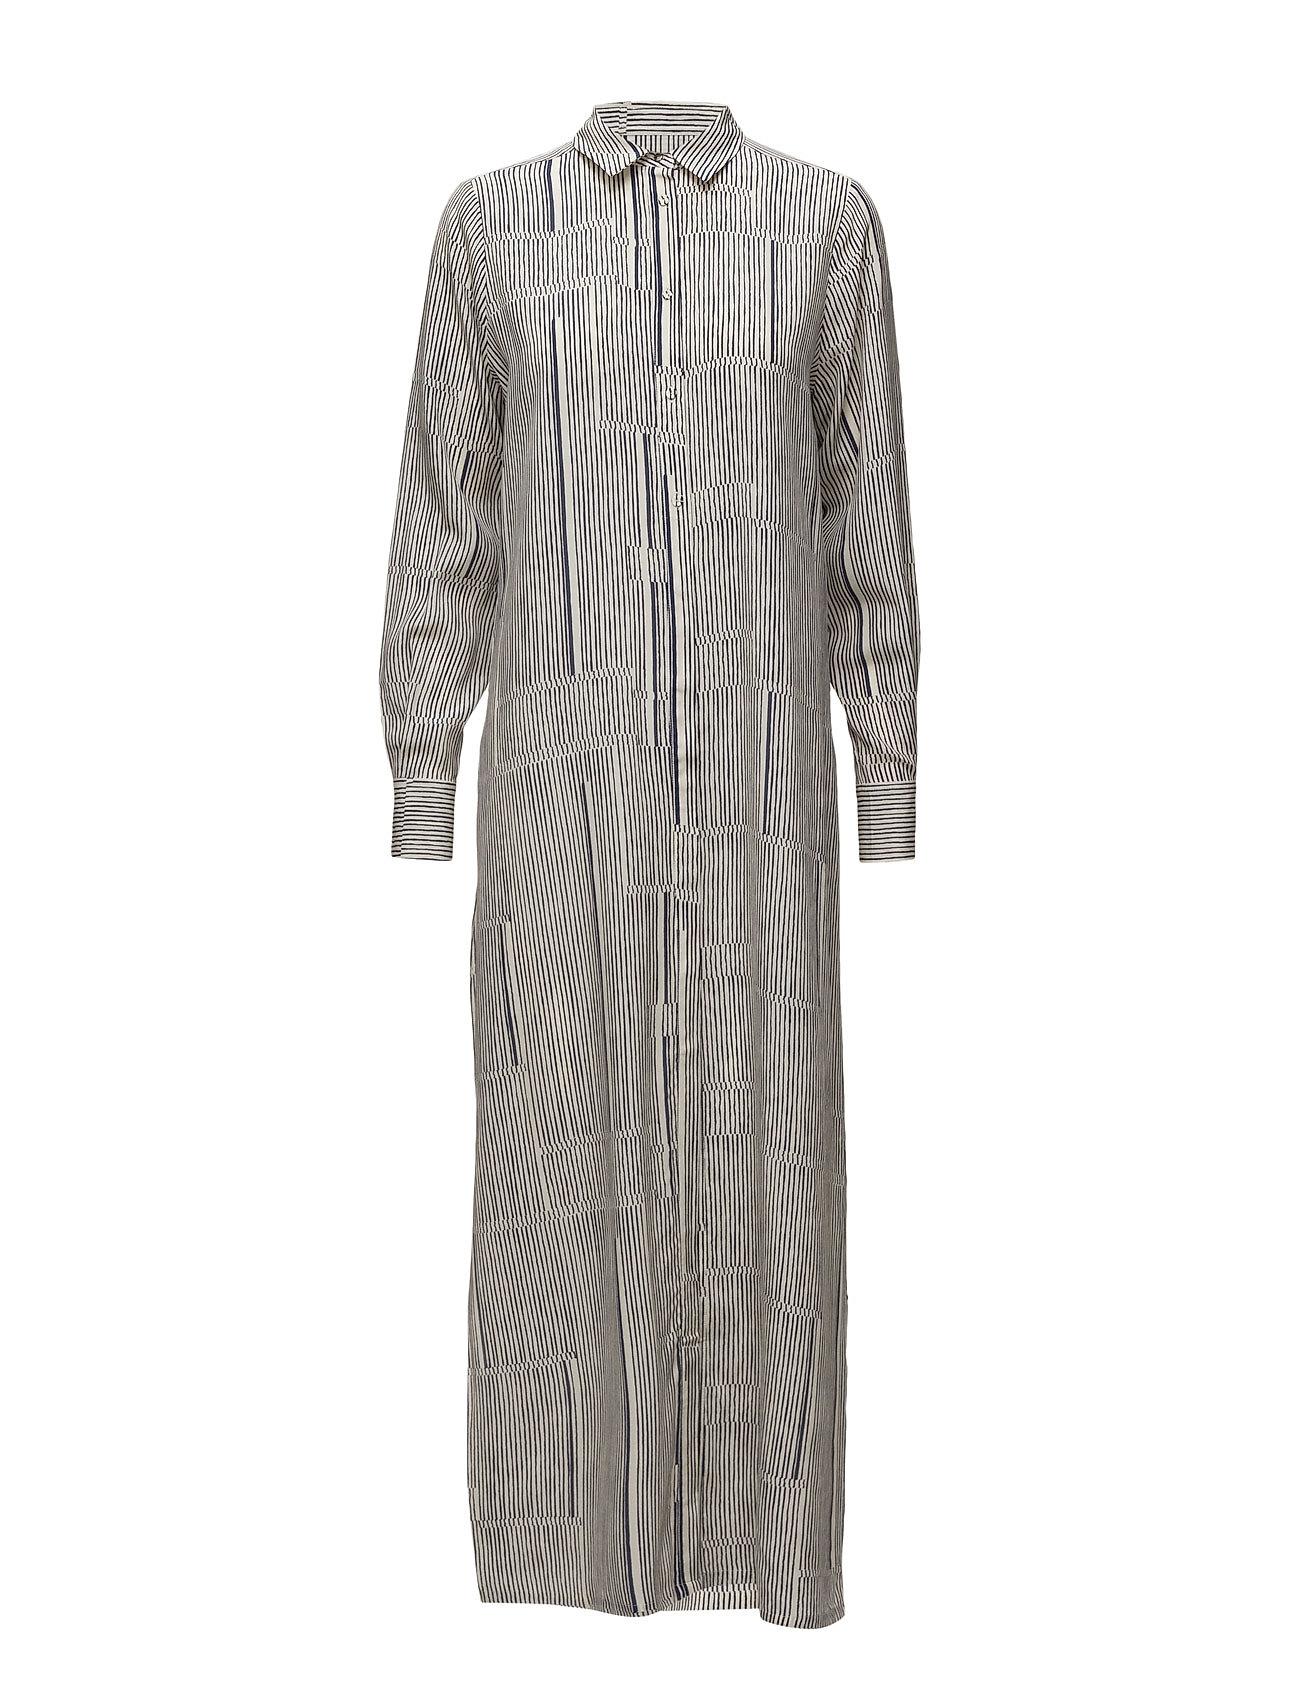 Dress Long Sleeve Noa Noa Maxi Kjoler til Kvinder i Print Blå